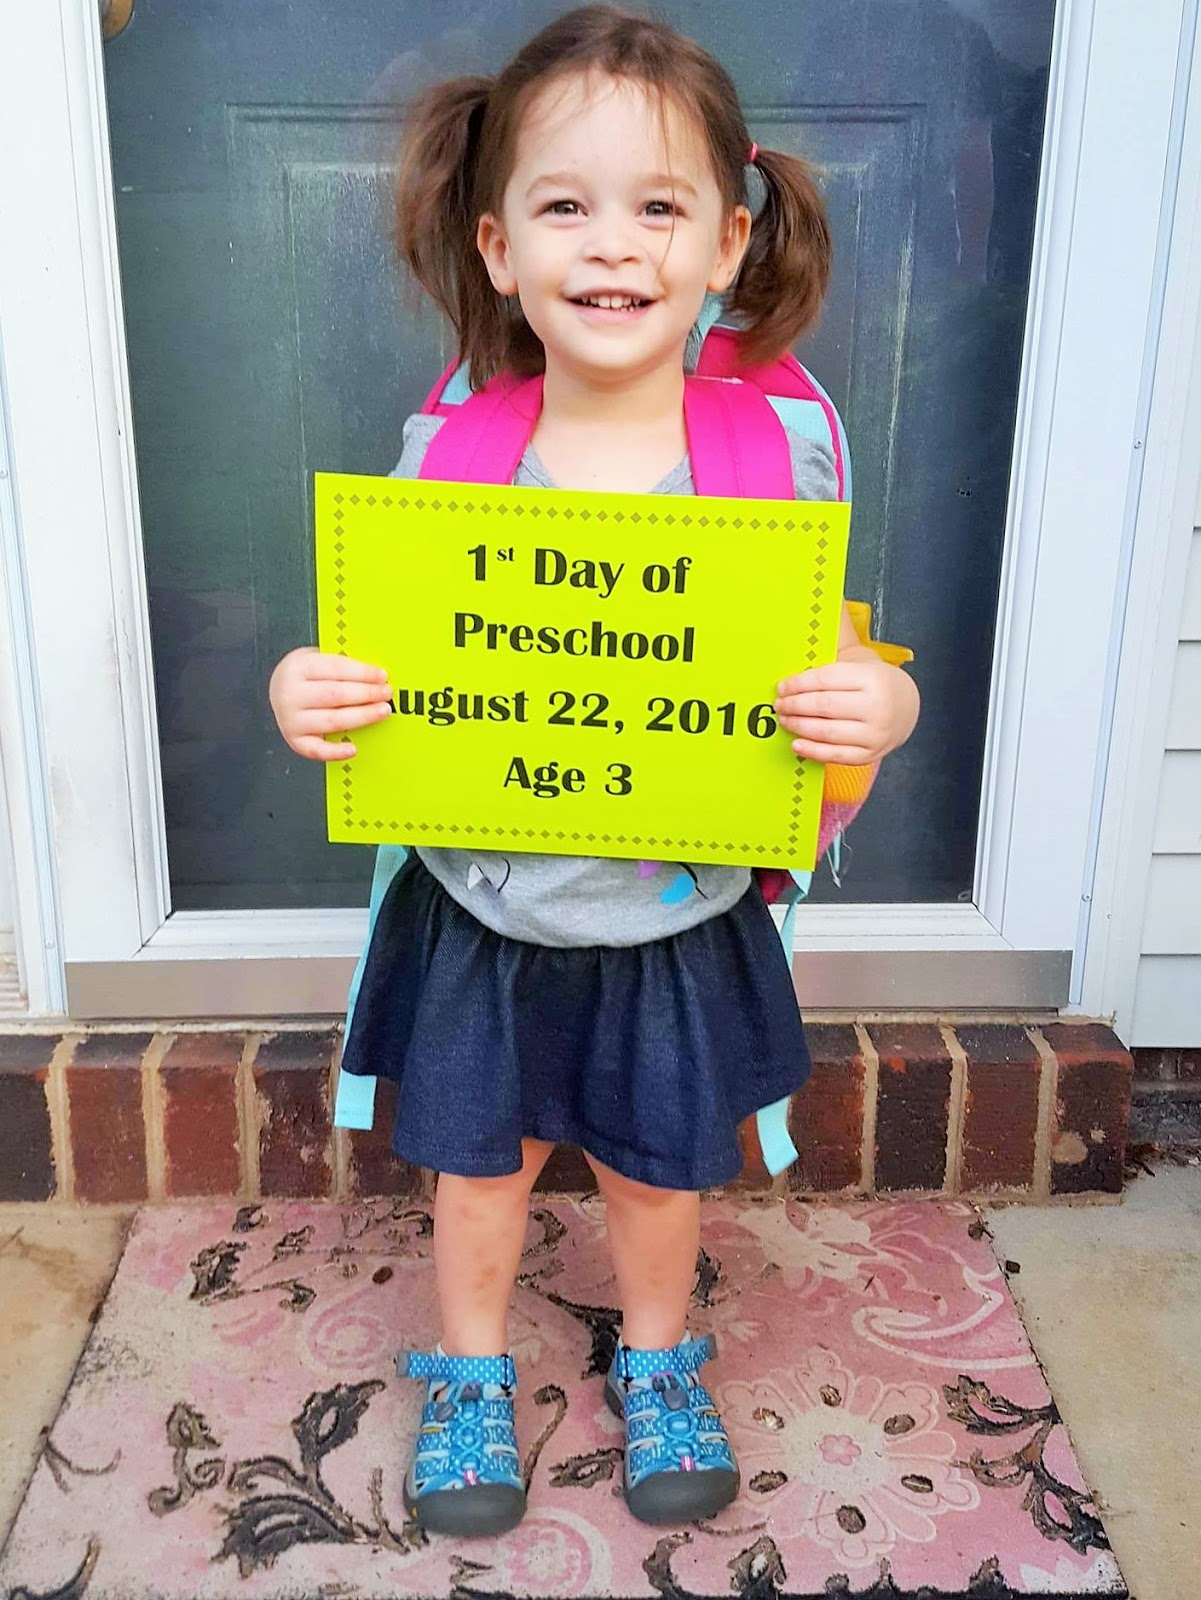 14087206 10102314526851728 573866551 o - 1st Day Of Kindergarten